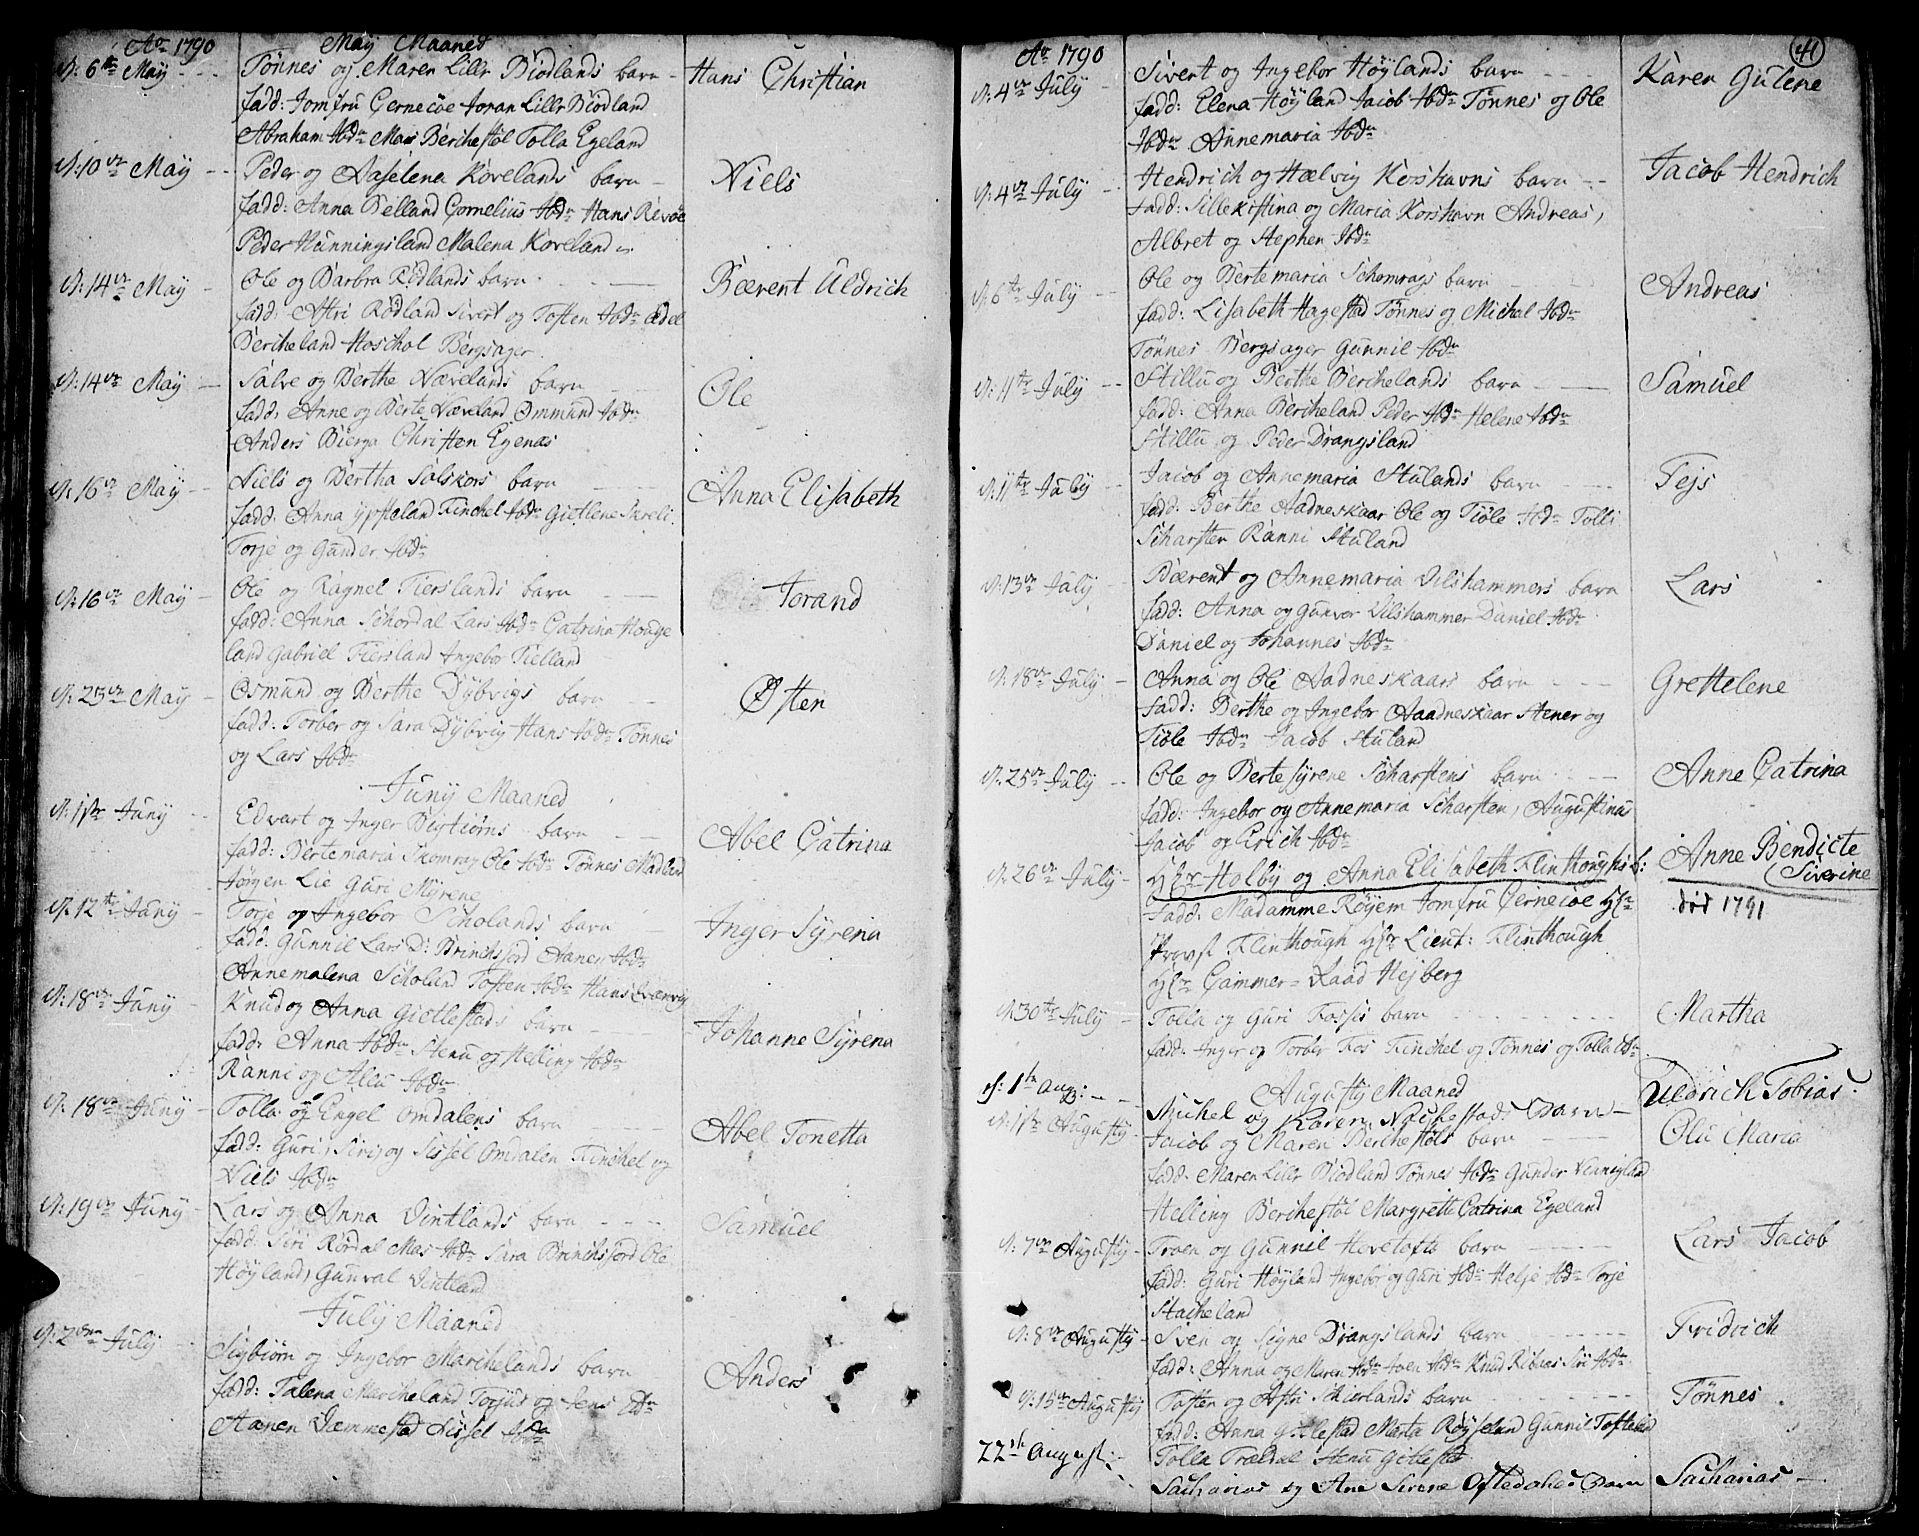 SAK, Lyngdal sokneprestkontor, F/Fa/Fac/L0004: Ministerialbok nr. A 4, 1780-1815, s. 41